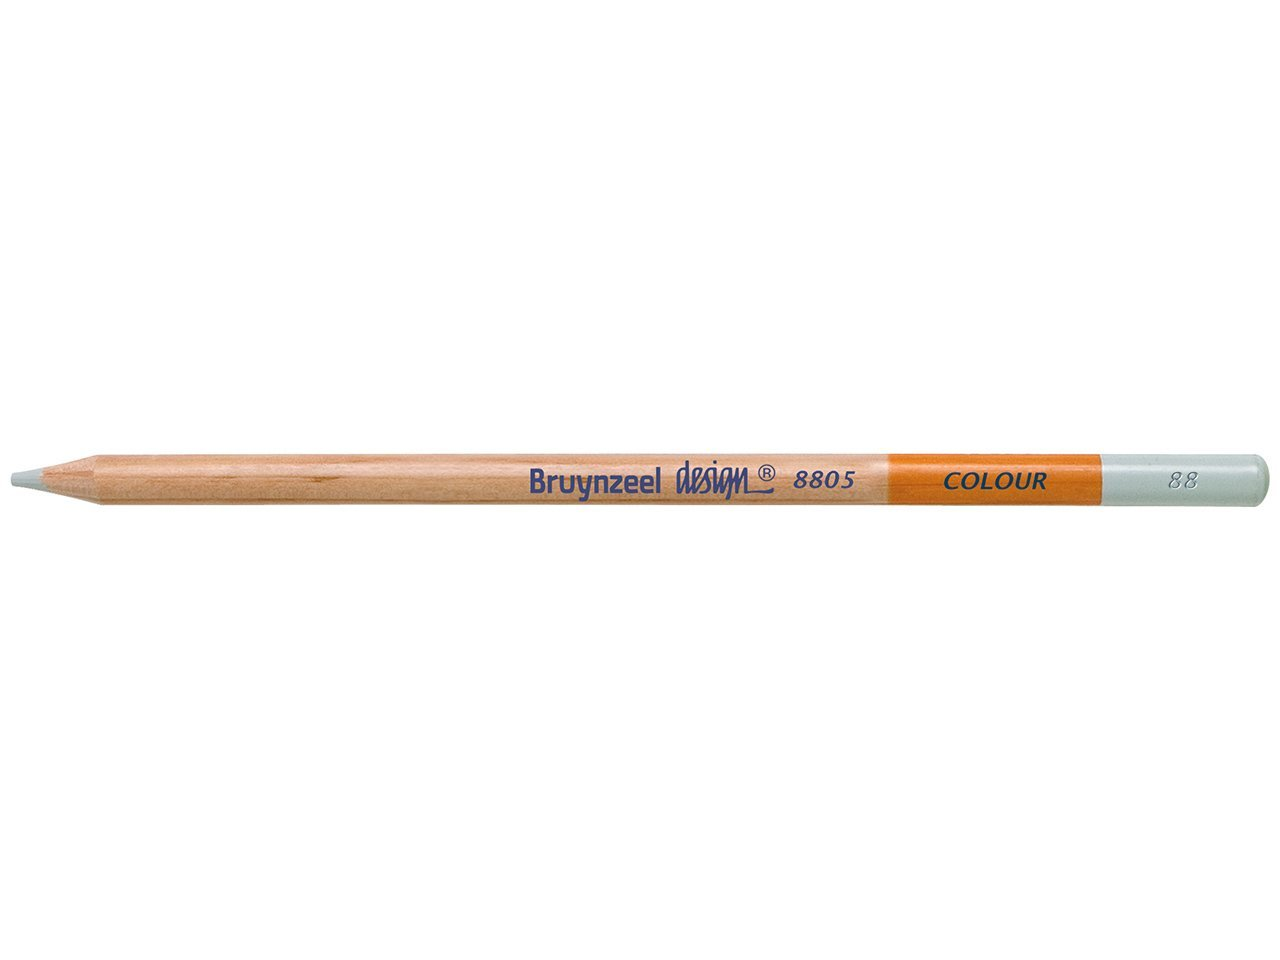 Bruynzeel Pencil - 88 Dull Cold Grey